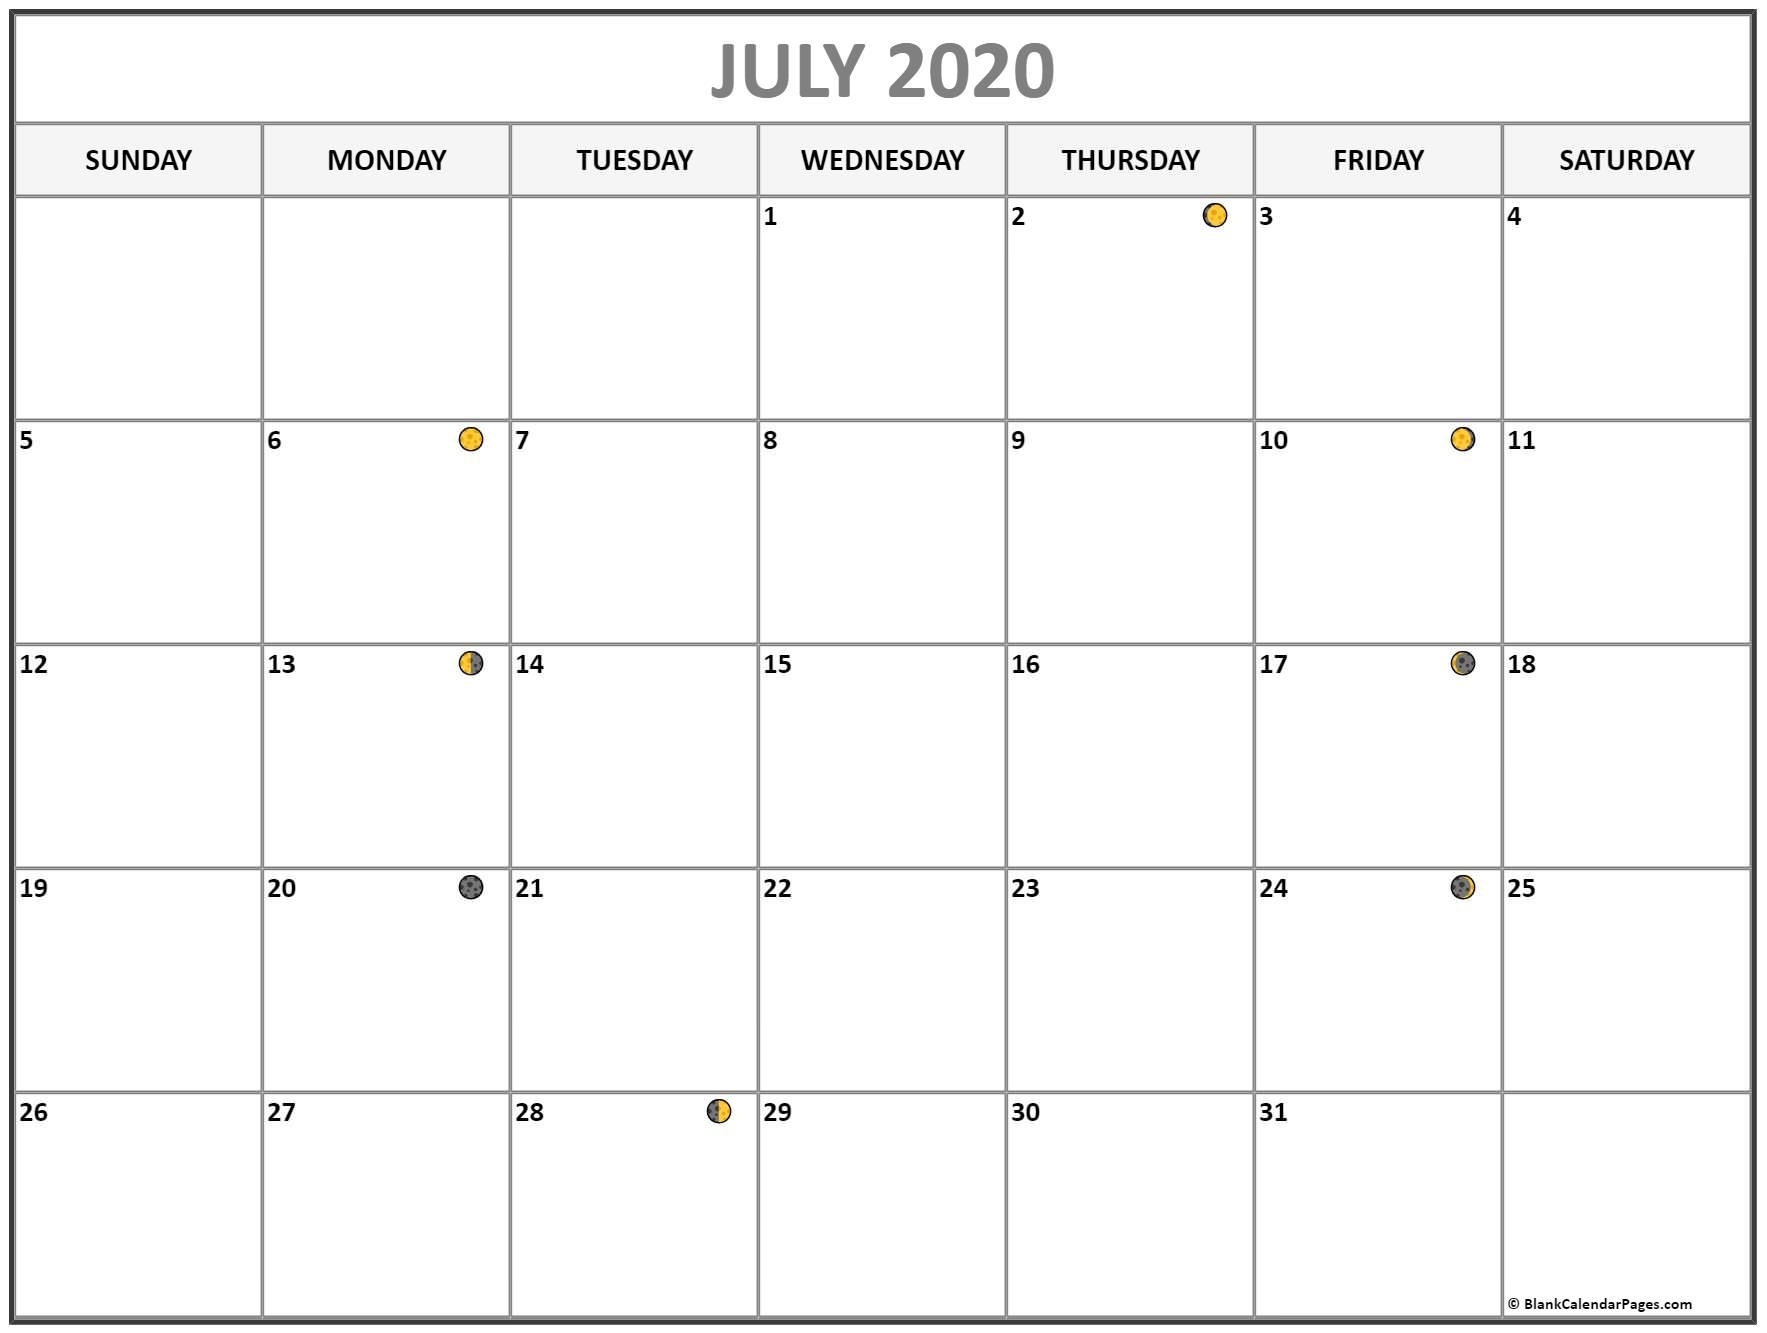 July 2020 Lunar Calendar | Moon Phase Calendar